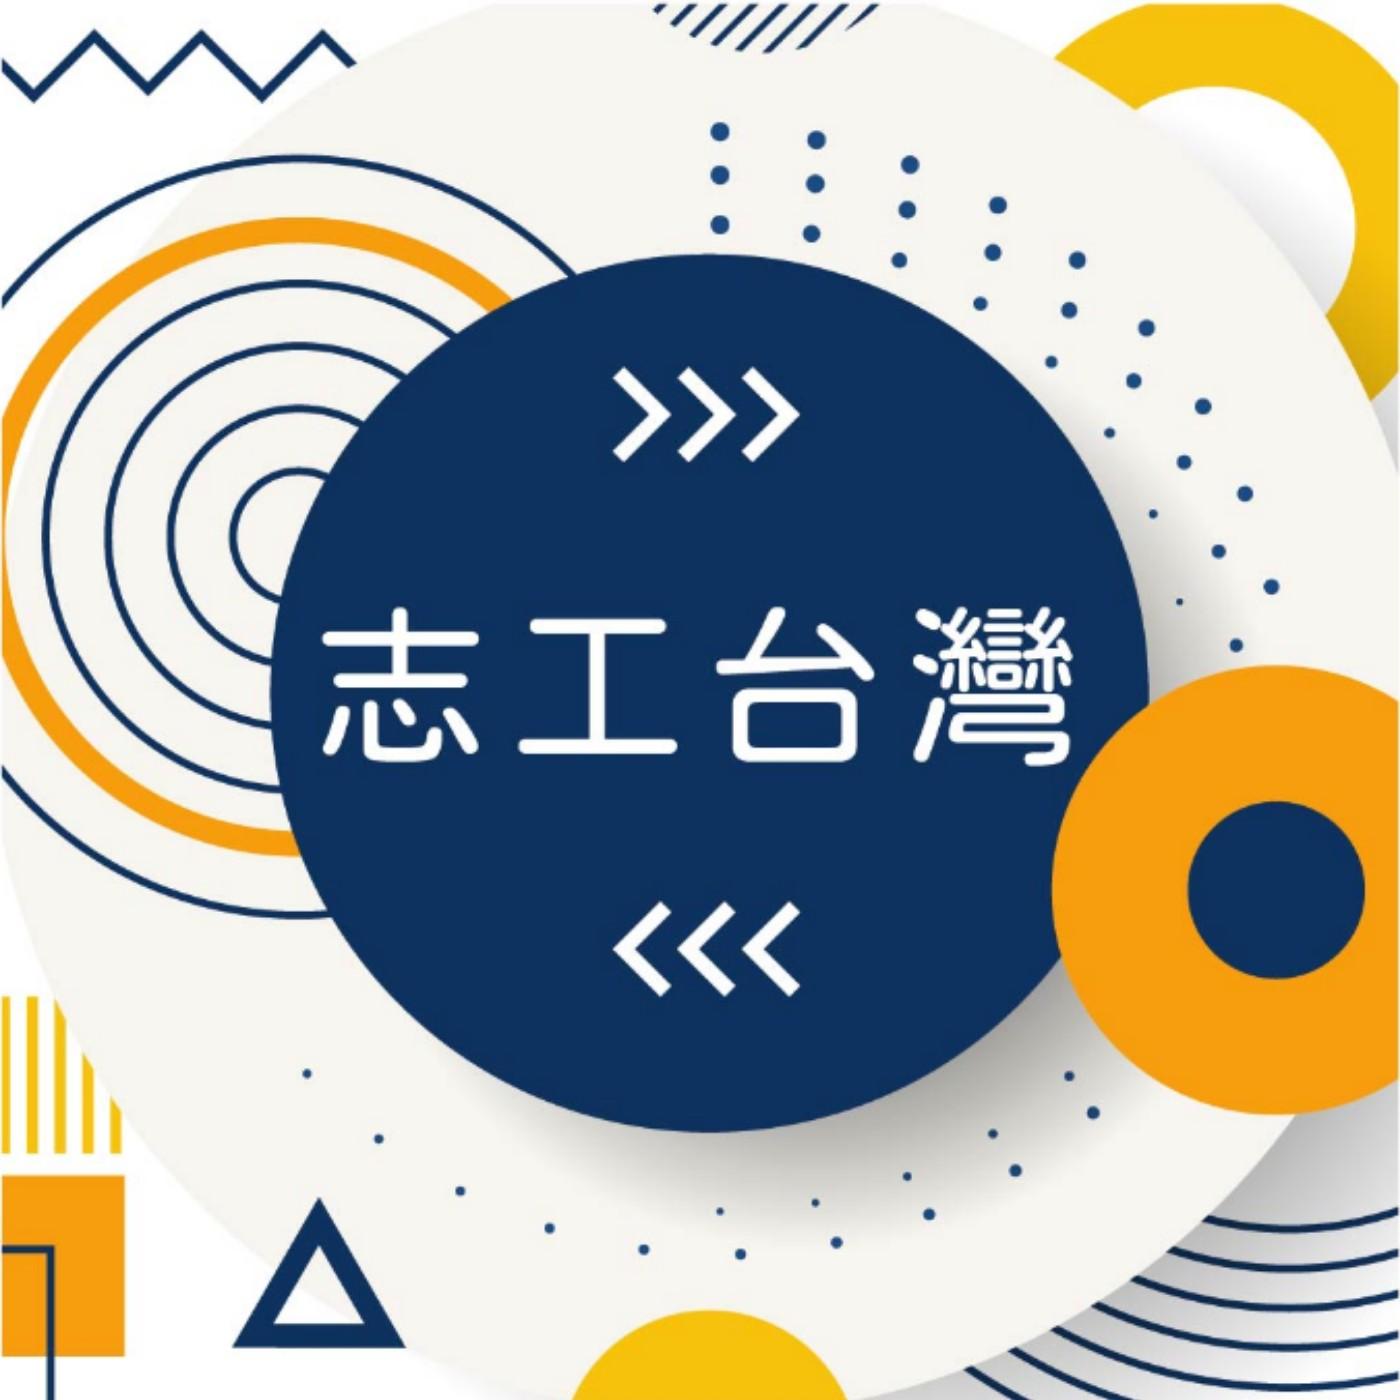 EP65:我覺得台灣年輕人最需要的就是信心跟勇氣  ─  徐韜 (上)